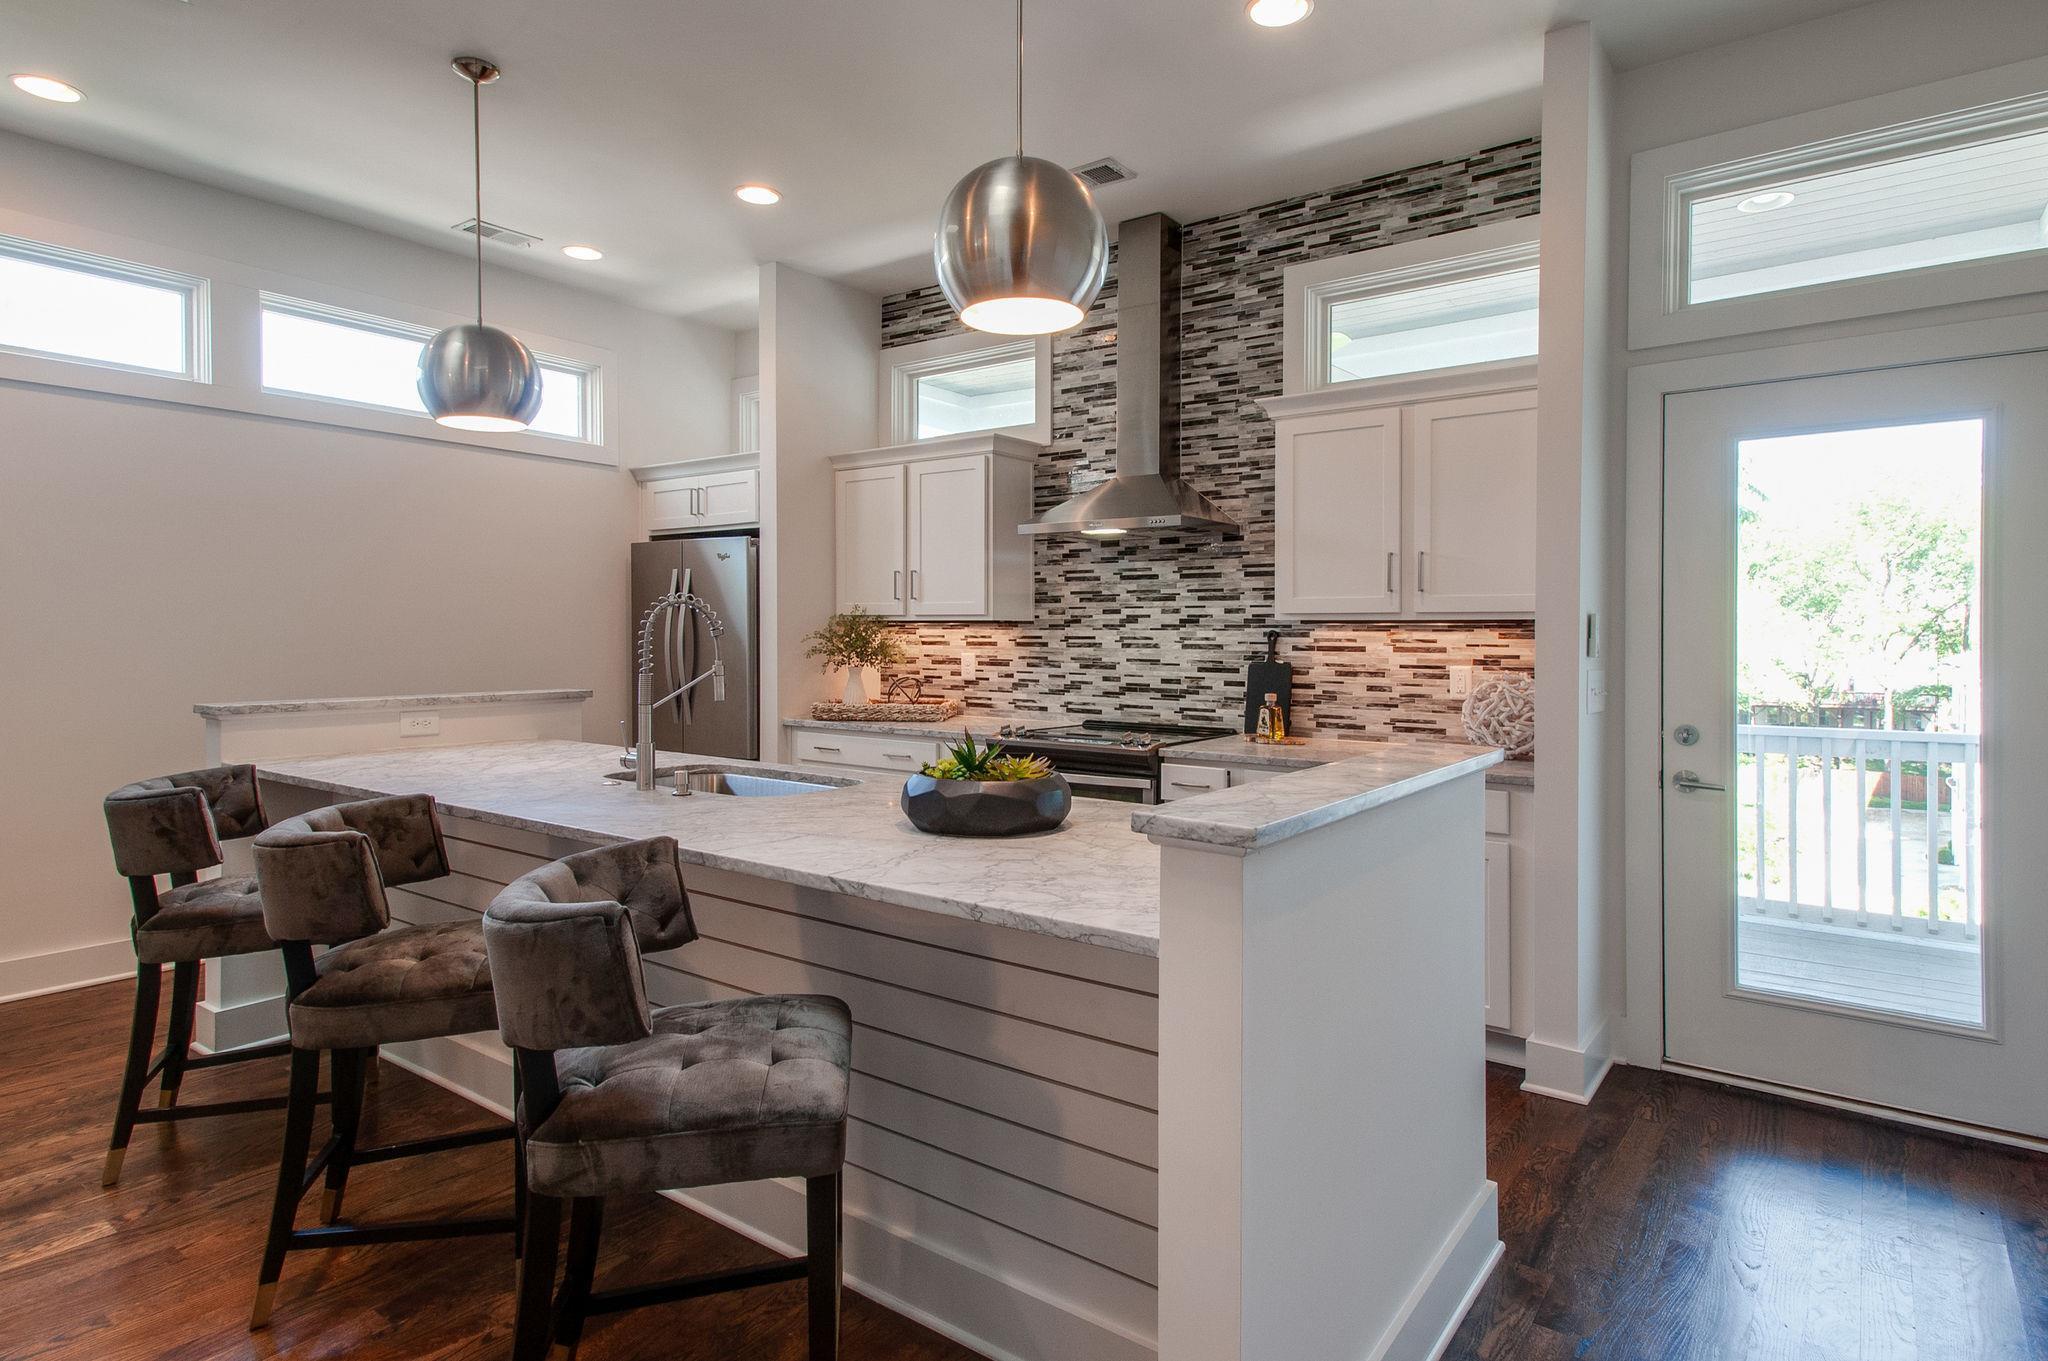 409A S 14Th St, Nashville, TN 37206 - Nashville, TN real estate listing